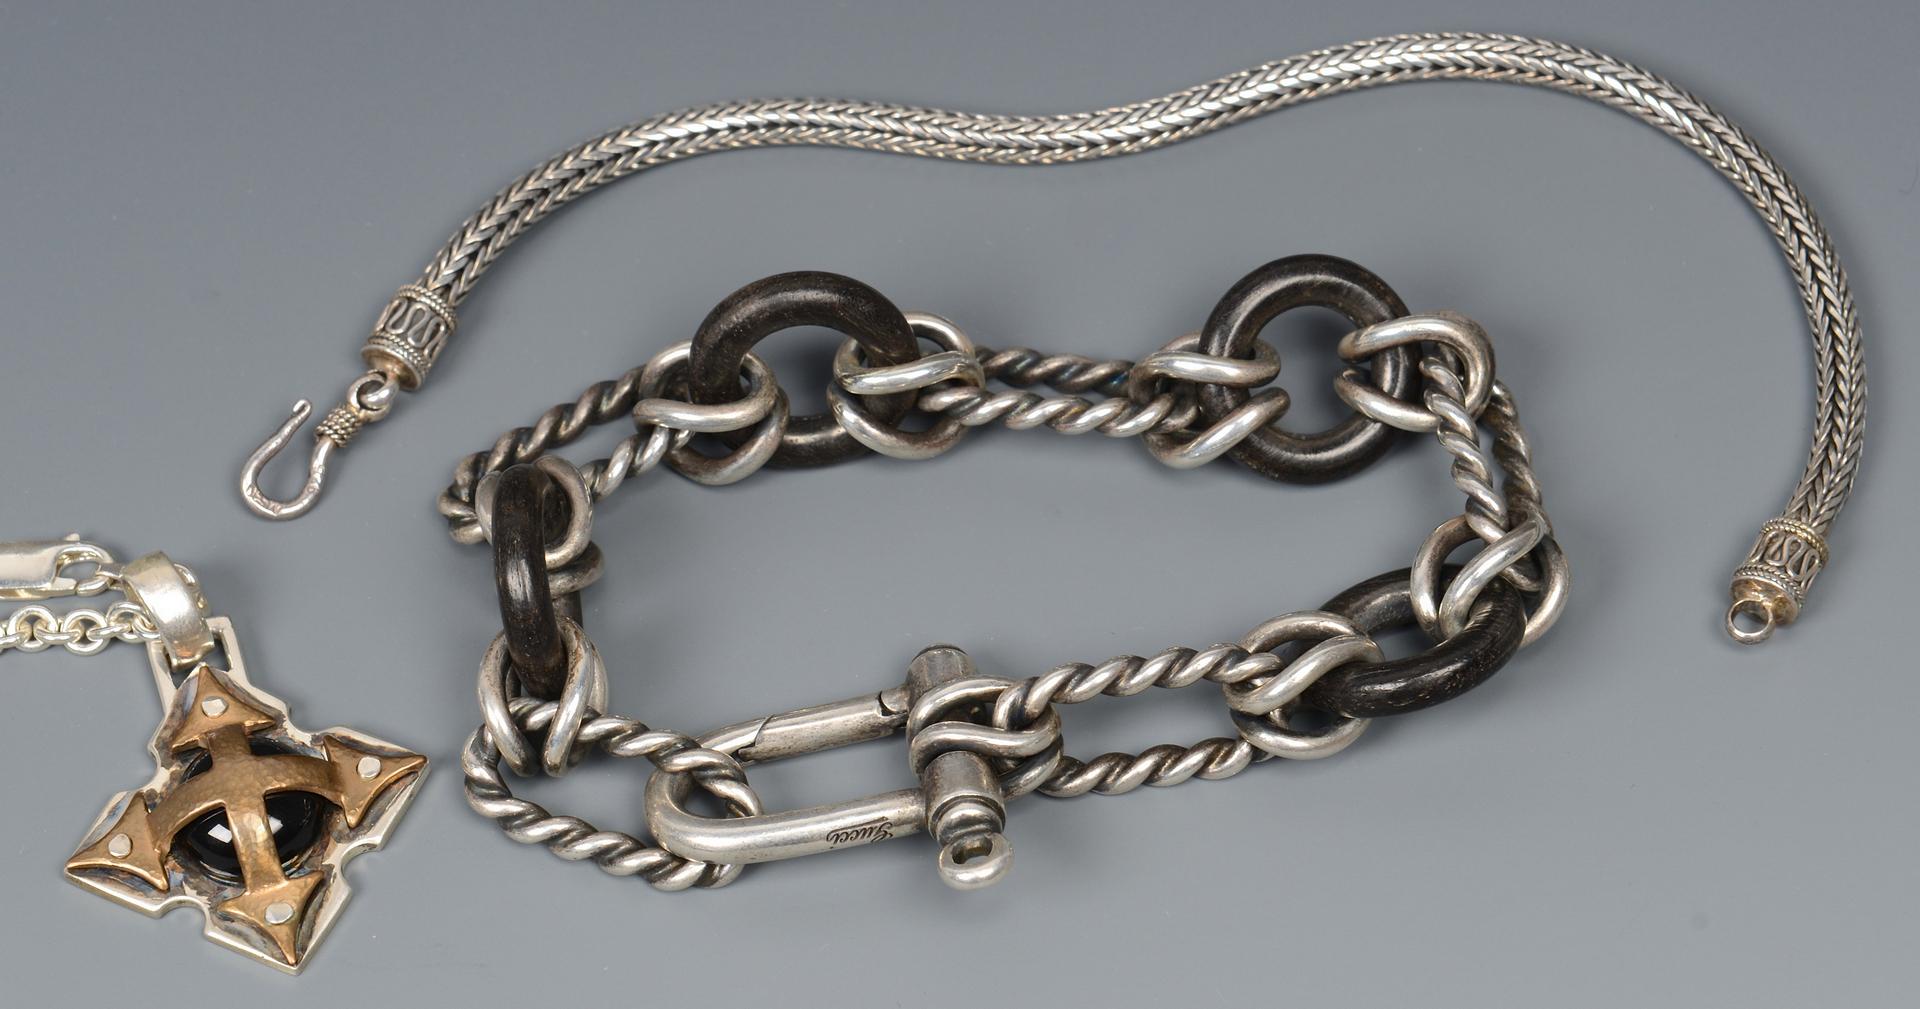 Lot 581: Group of Men's Designer Jewelry